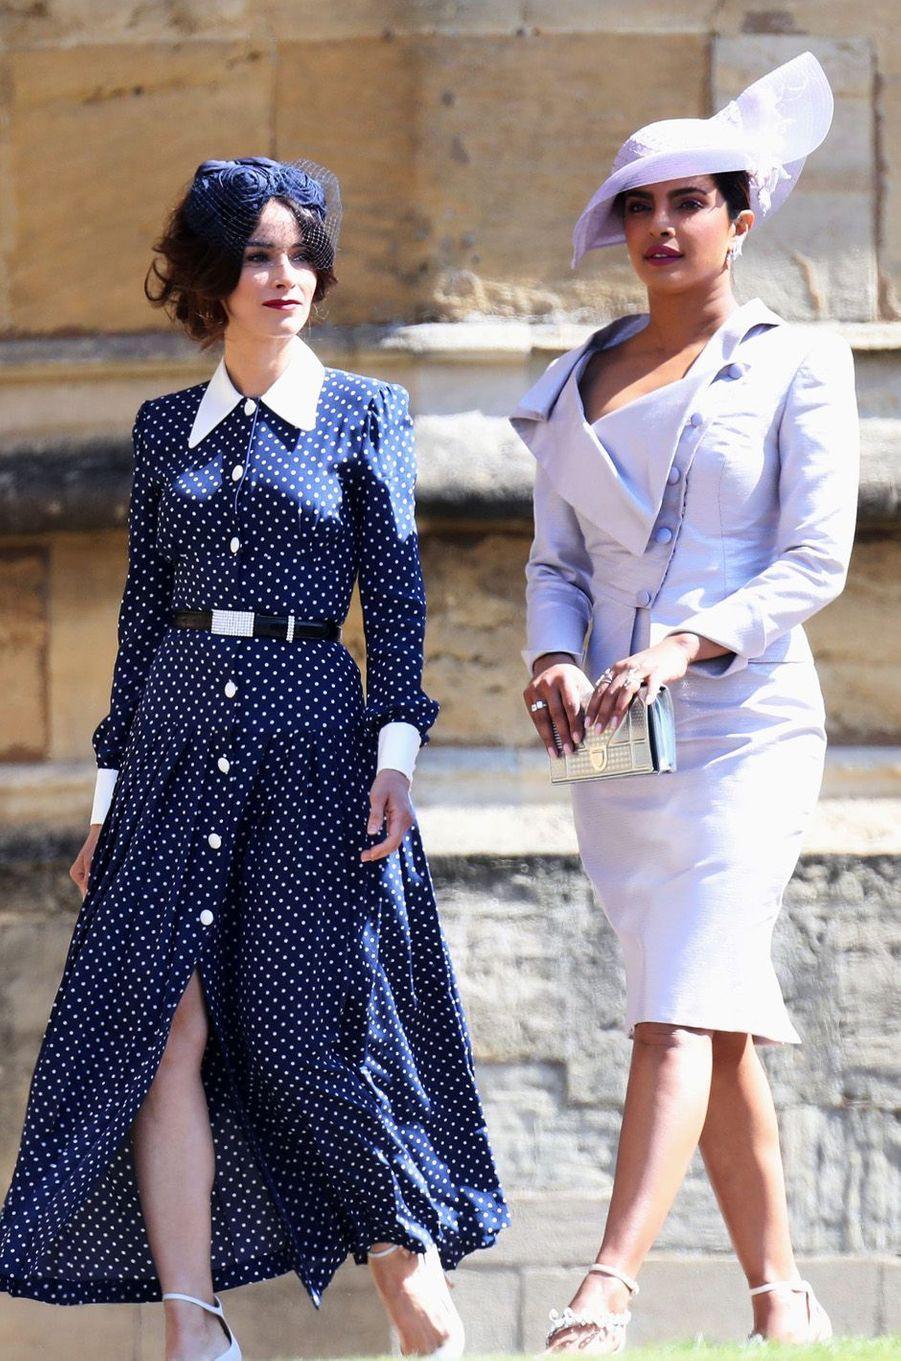 Priyanka Chopra accompagnée d'Abigail Spencer au mariage de Meghan et Harry, le 19 mai 2018.